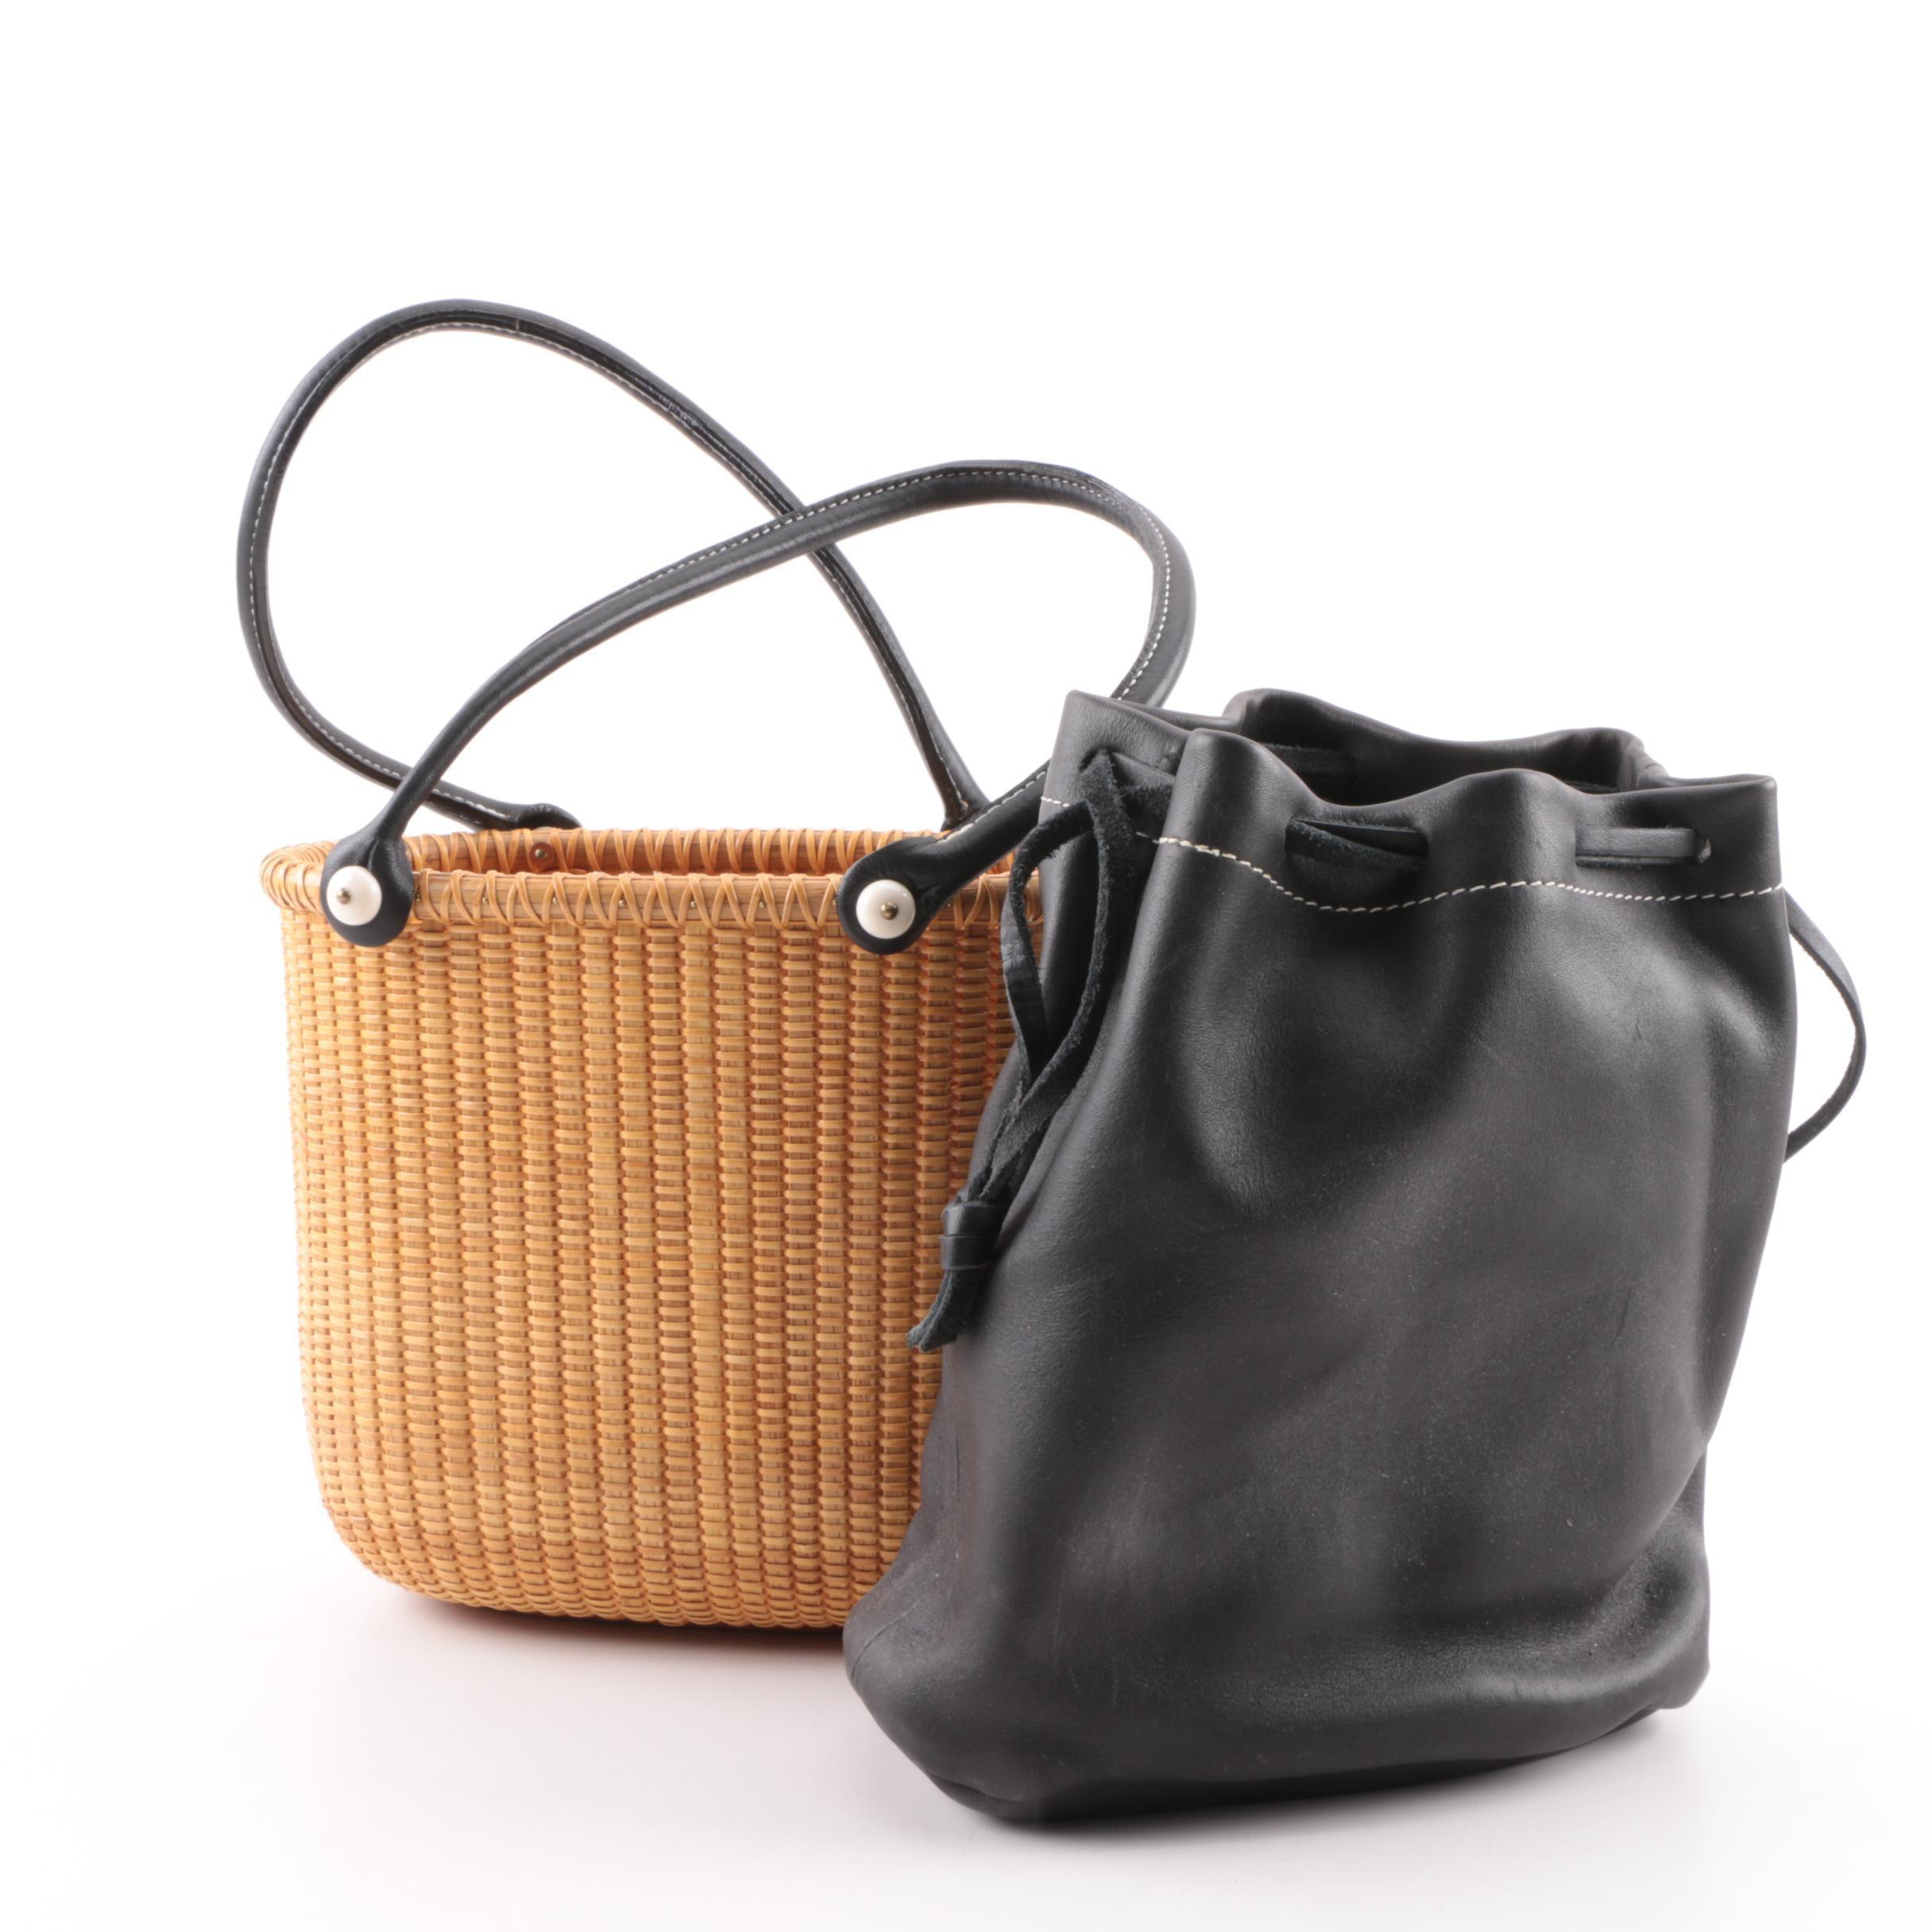 Karen Bullock Nantucket Woven Raffia Basket Bag with Leather Liner